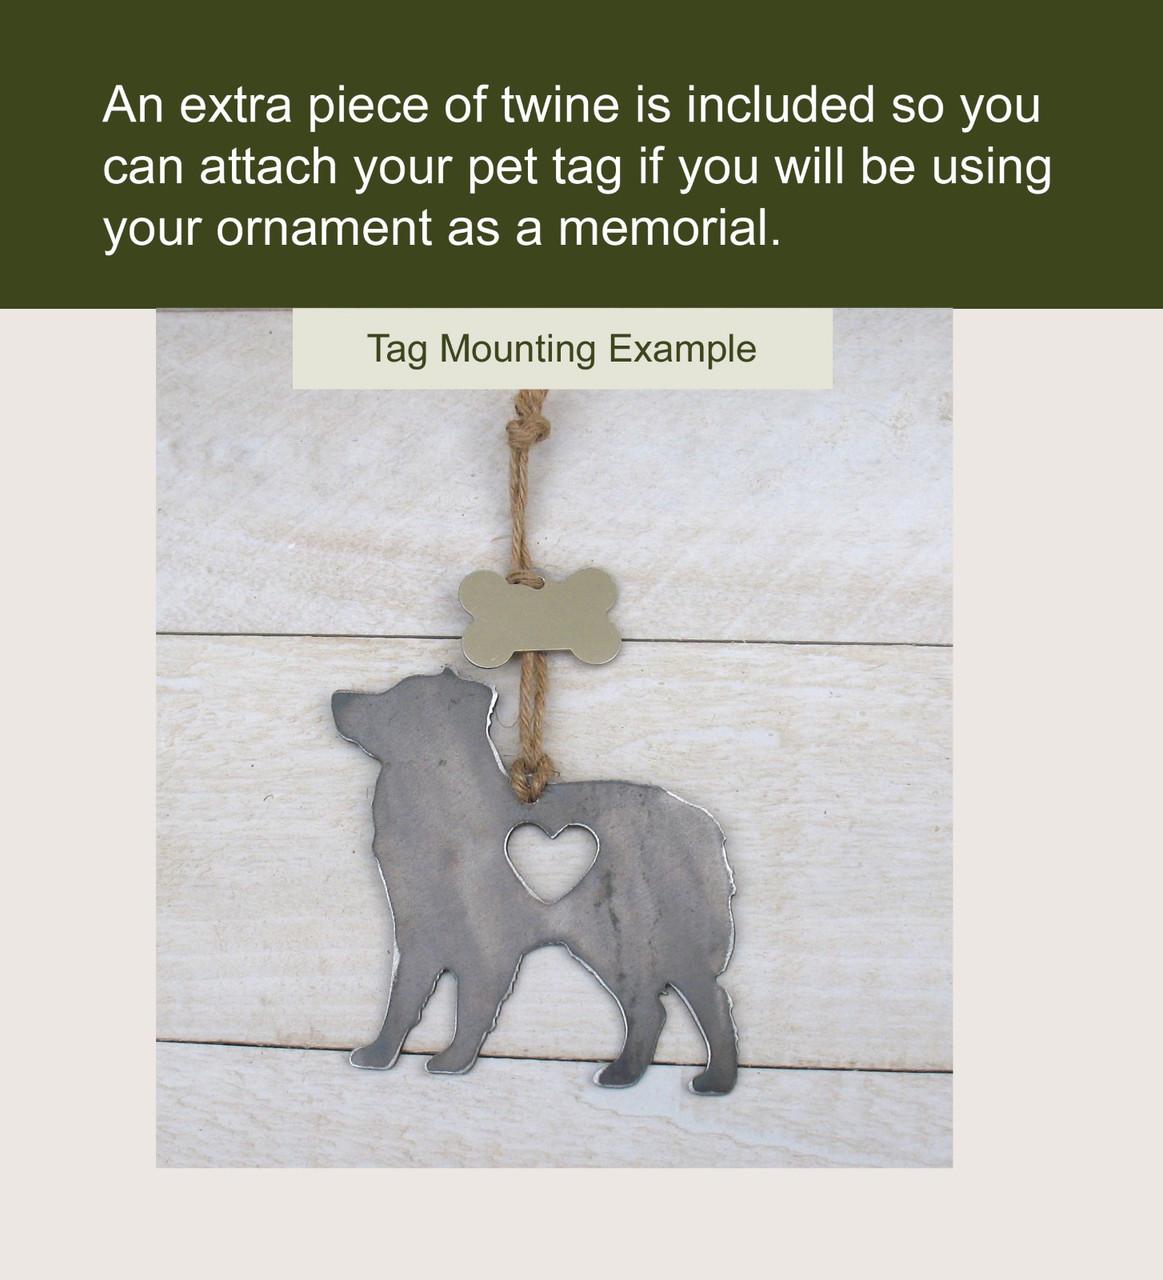 Alaskan Malamute Pet Loss Gift Ornament - Pet Memorial - Dog Sympathy Remembrance Gift - Metal Dog Christmas Ornament